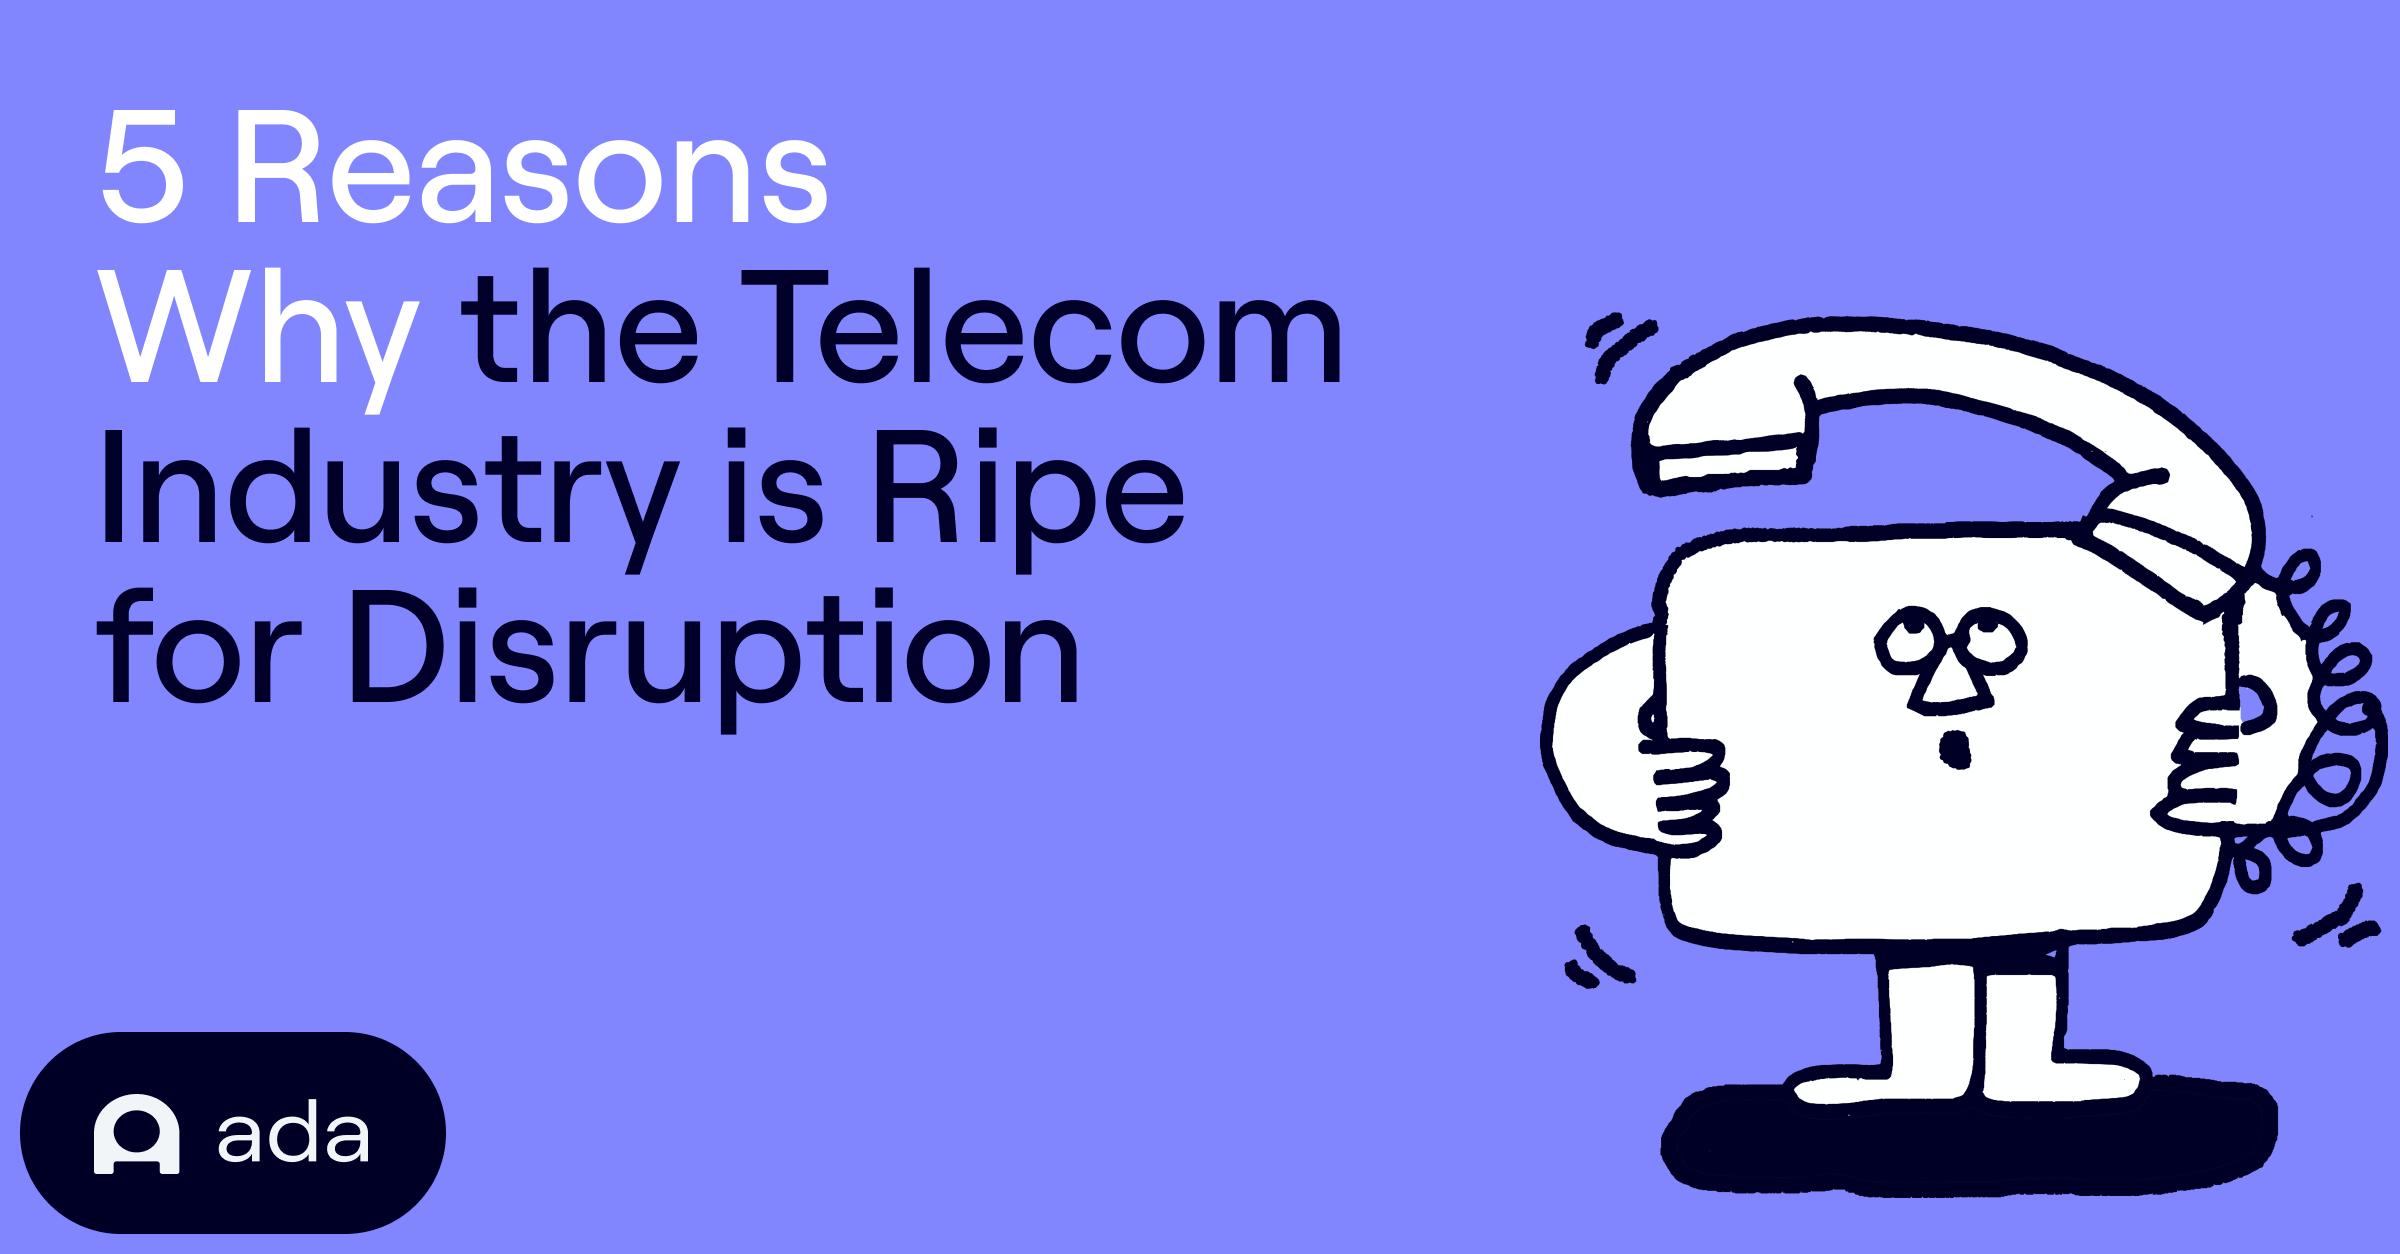 5 reasons why telecom